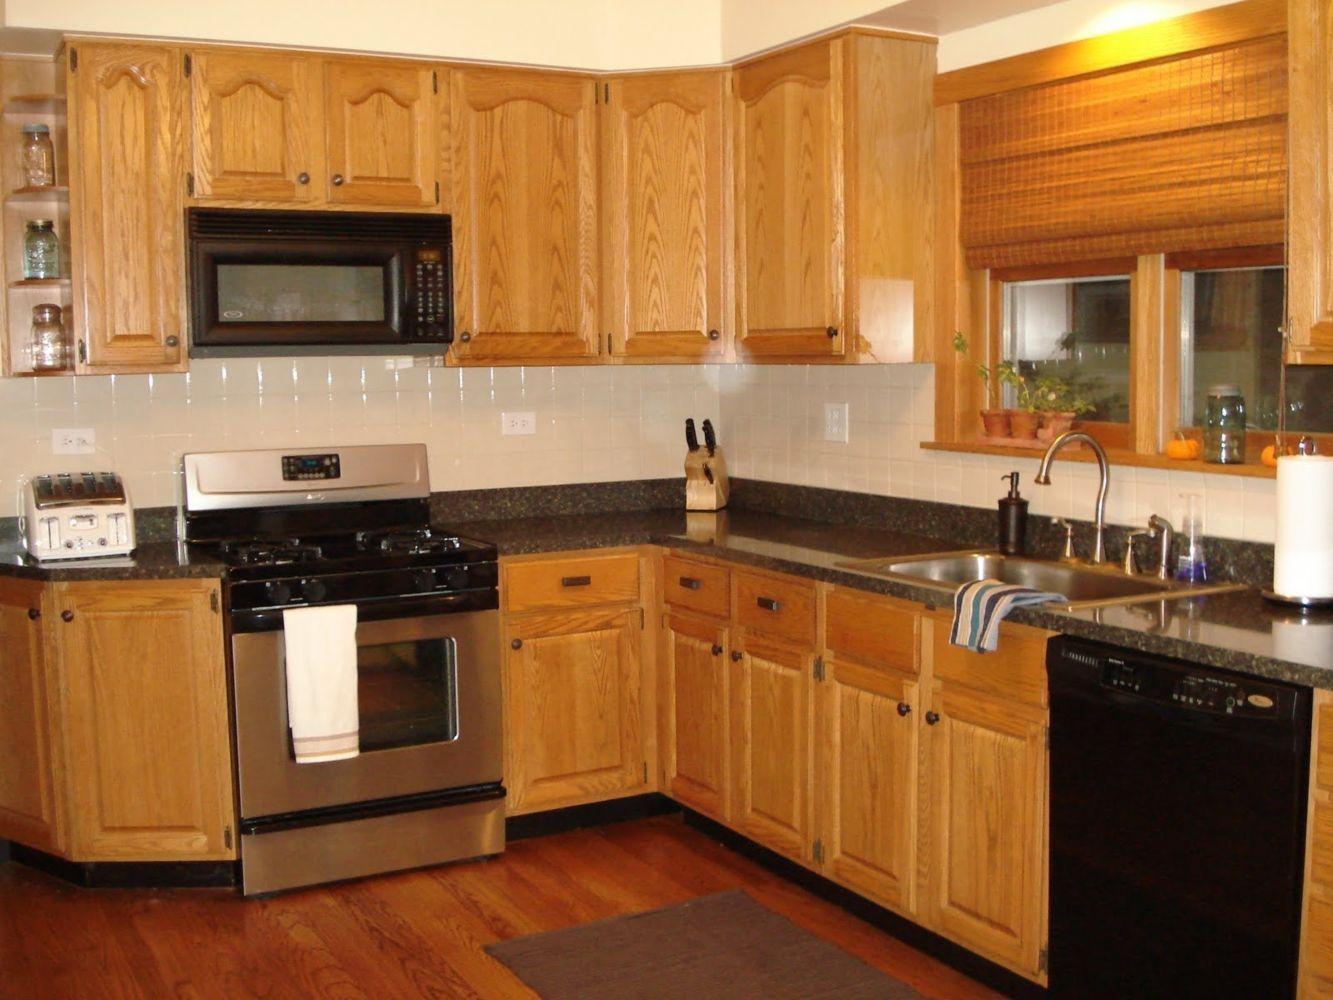 Gorgeous Kitchen With Black Laminate Countertops 9 Honey Oak Cabinets Oak Kitchen Cabinets Light Oak Cabinets